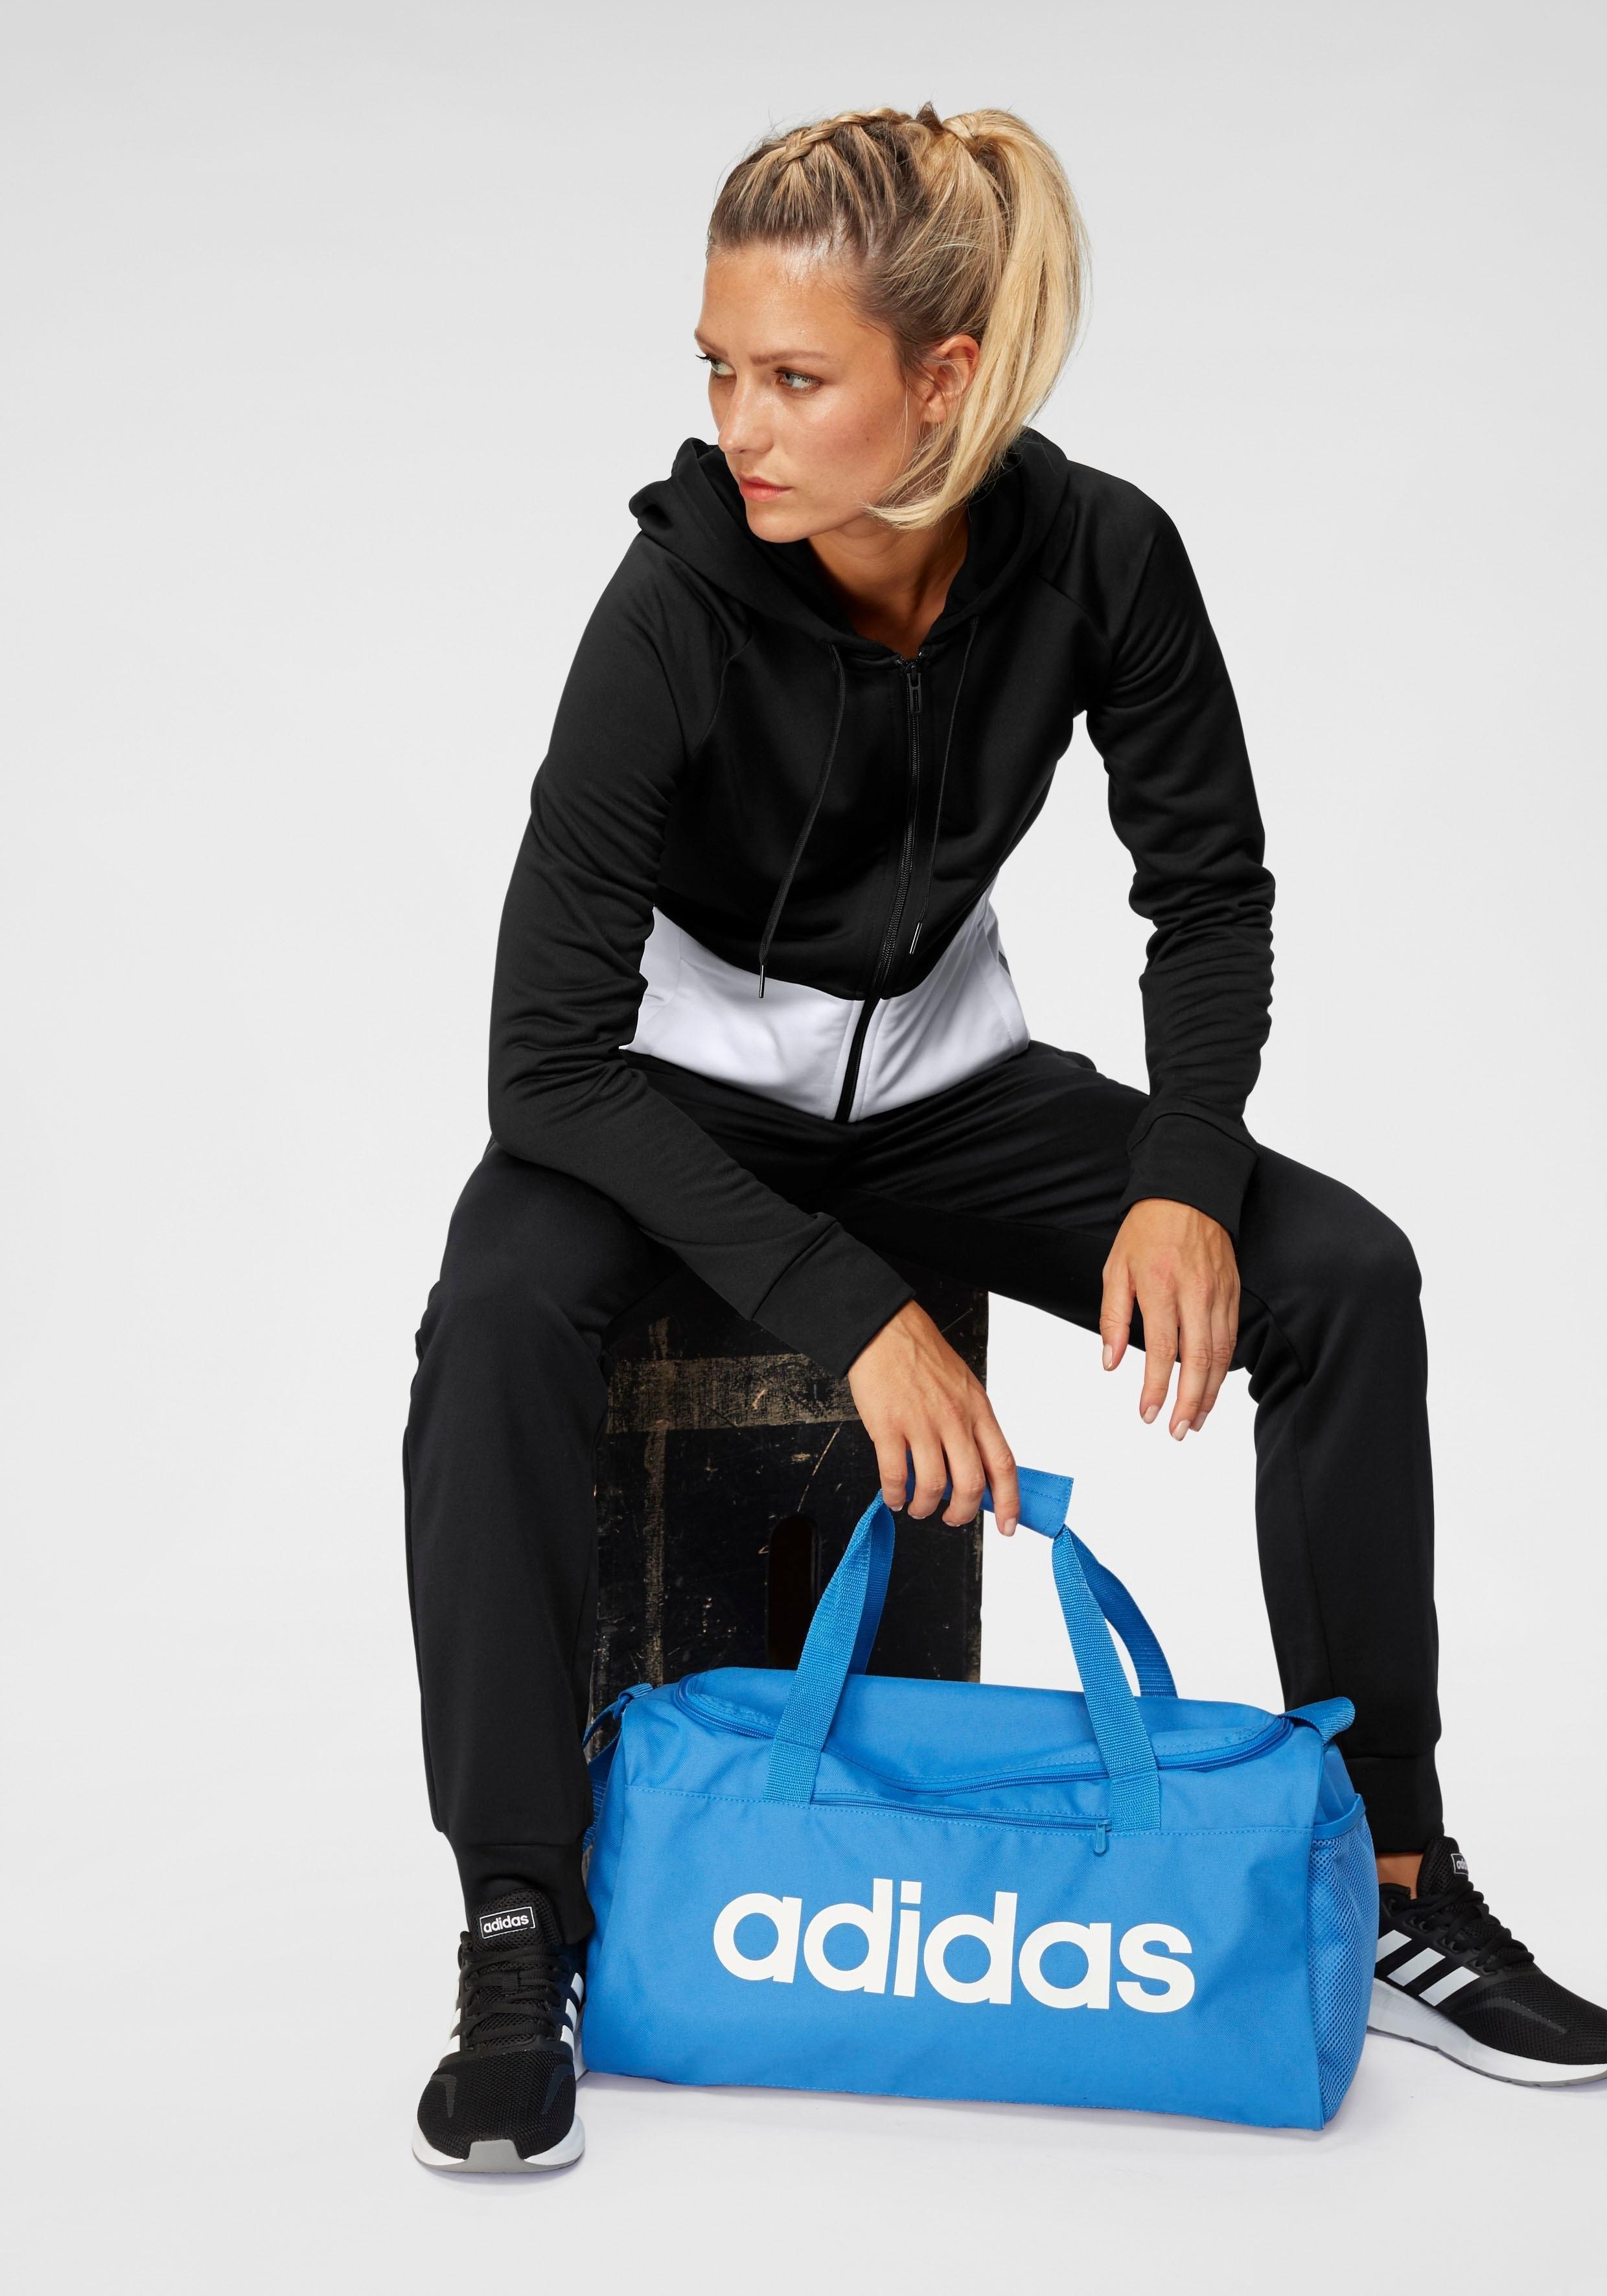 adidas Performance adidas trainingspak goedkoop op otto.nl kopen